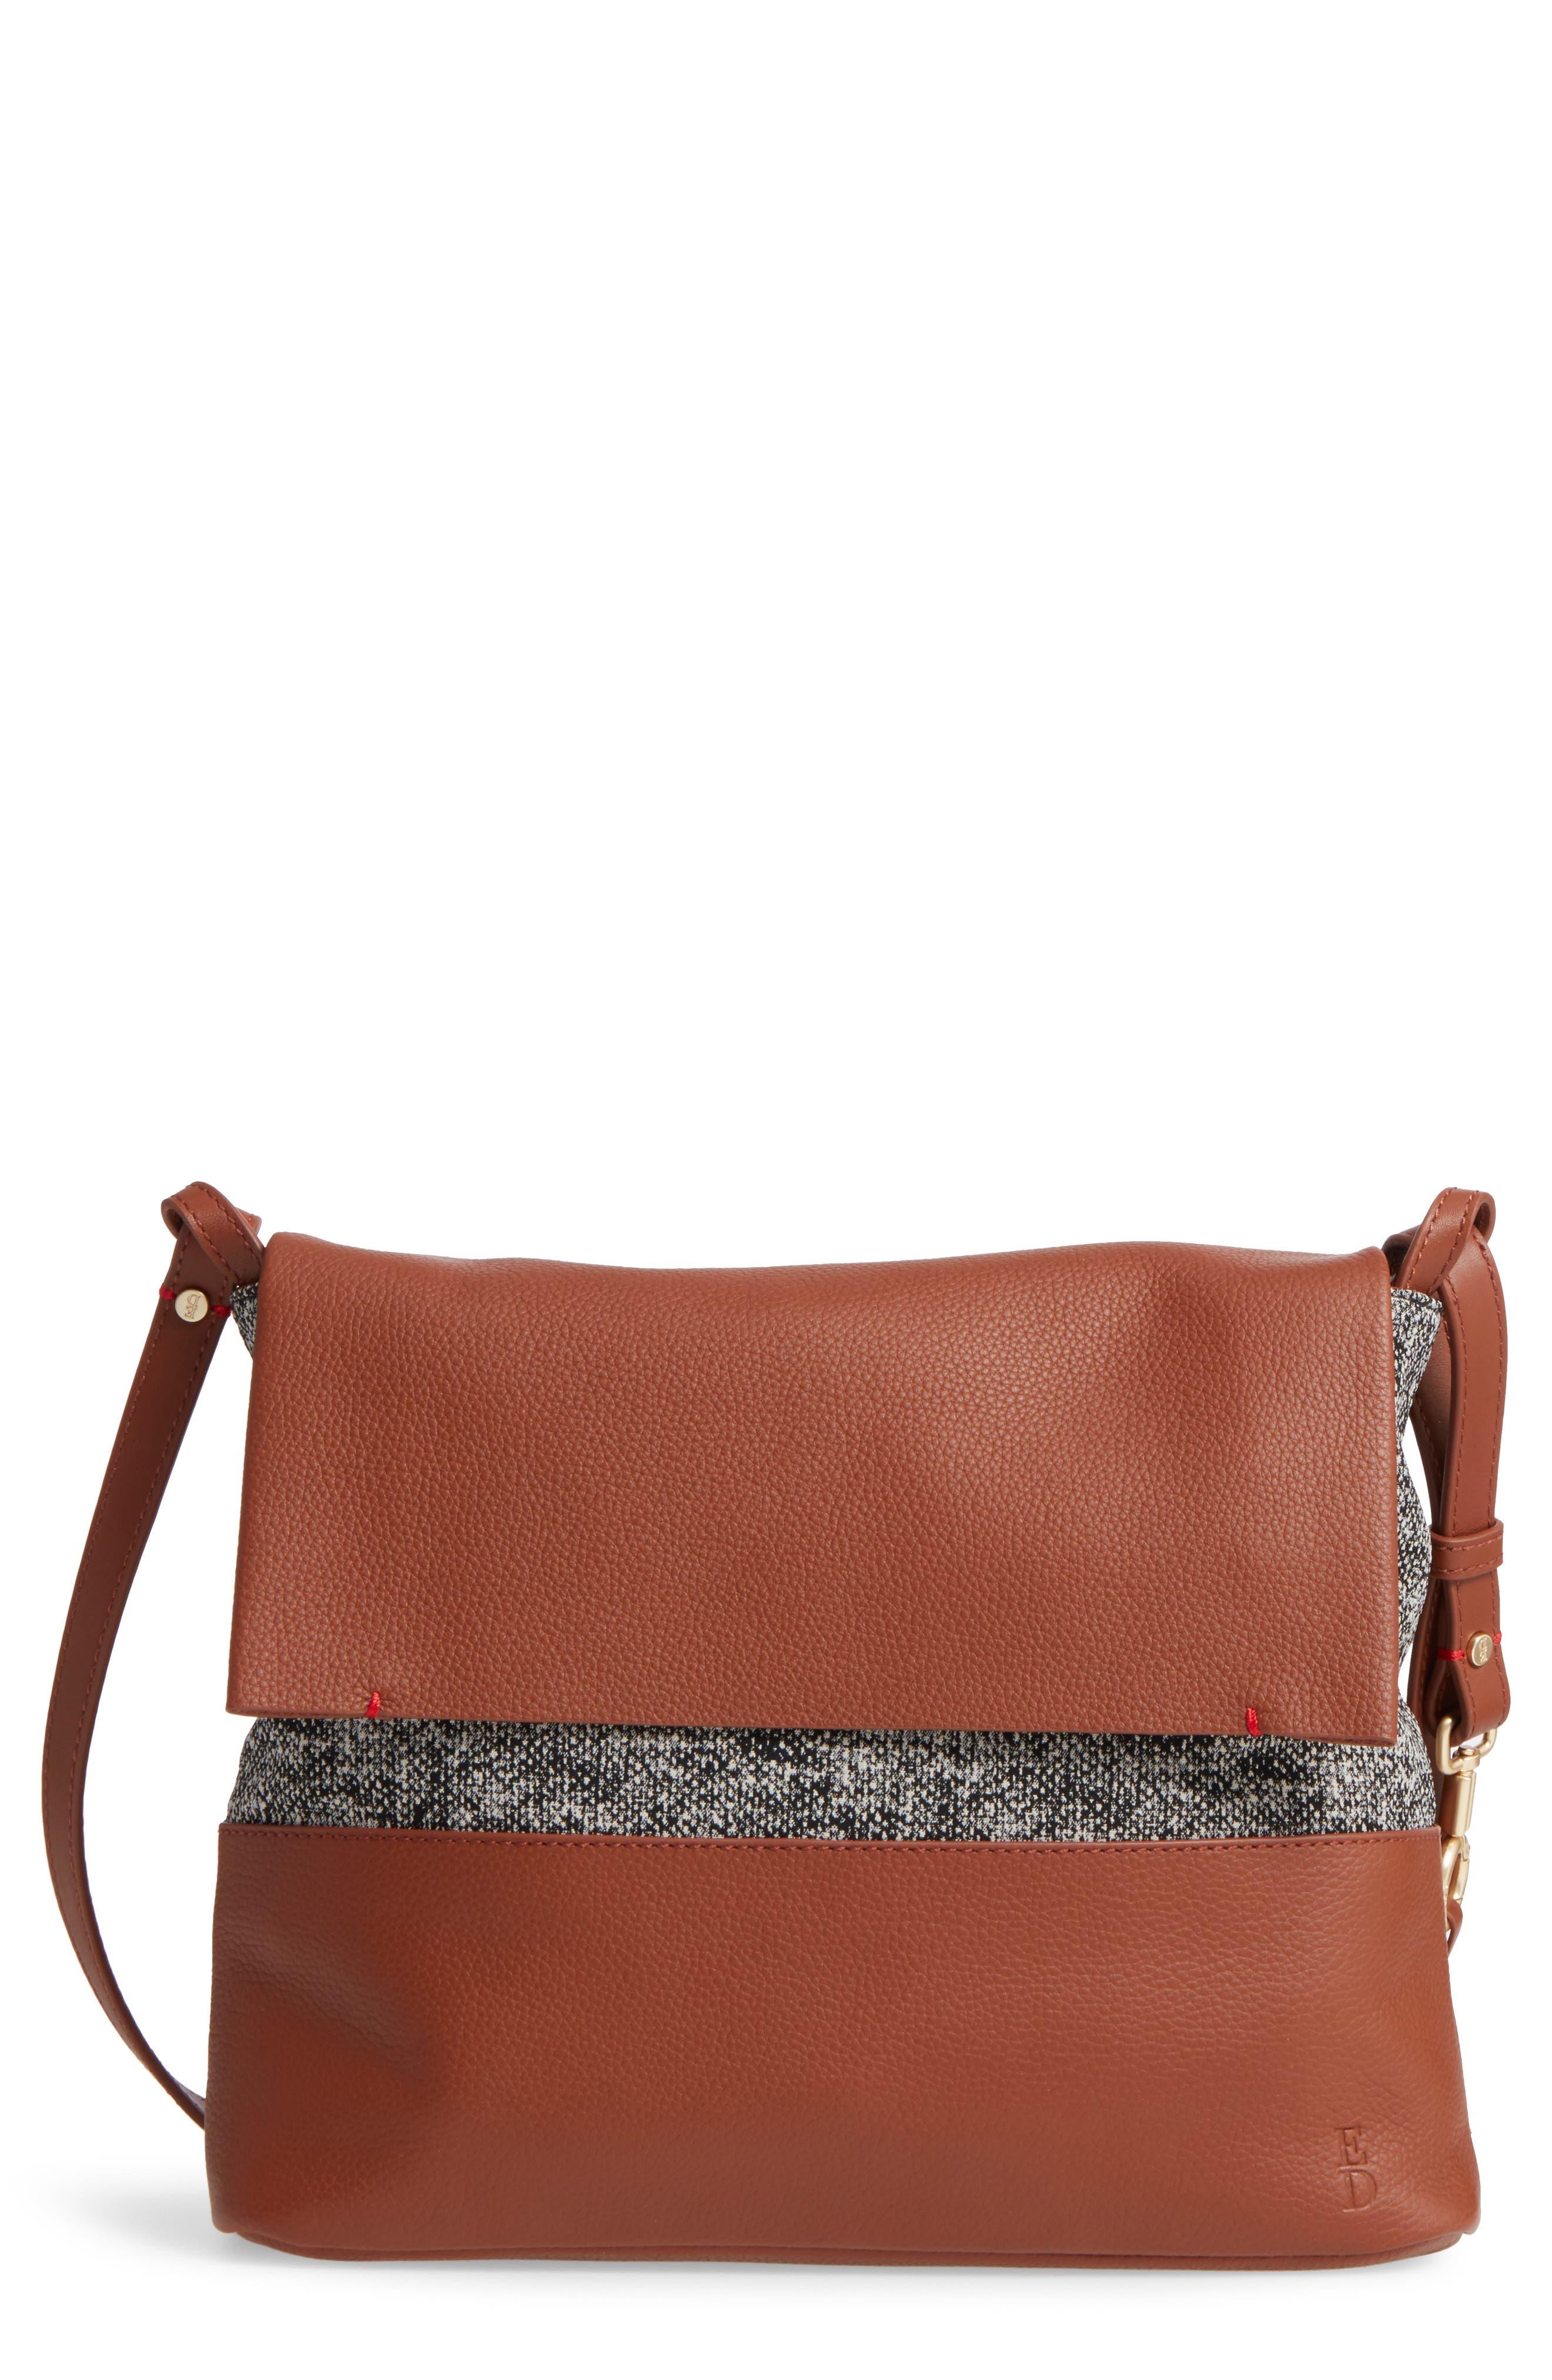 ED ELLEN DEGENERES Medium Brea Crossbody Bag